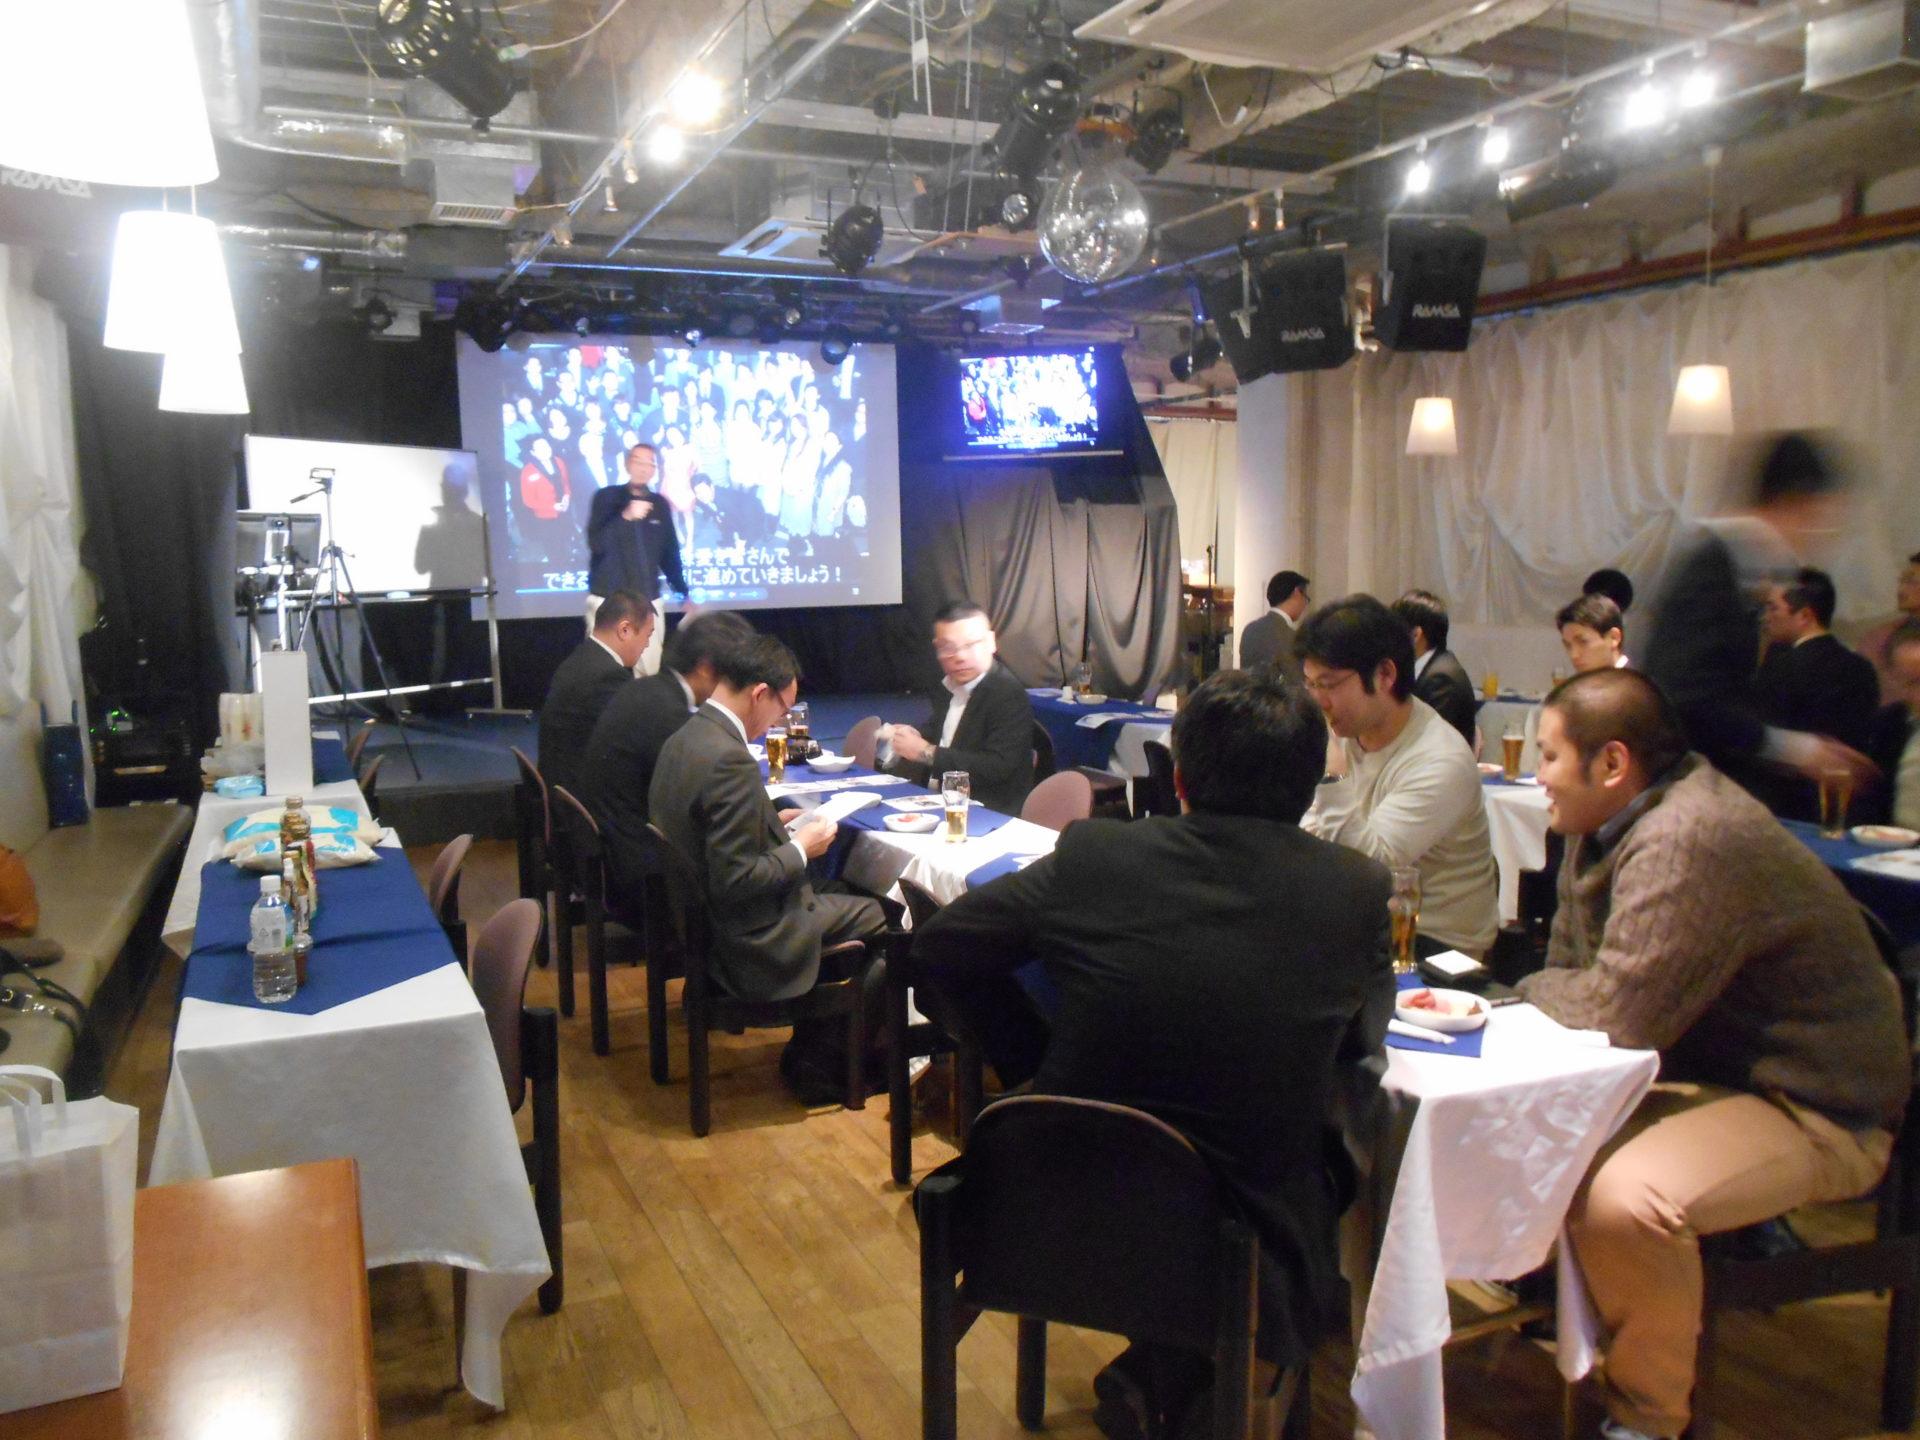 DSCN1057 1920x1440 - 2016年3月11日(金)AOsuki総会&パーティー開催しました。